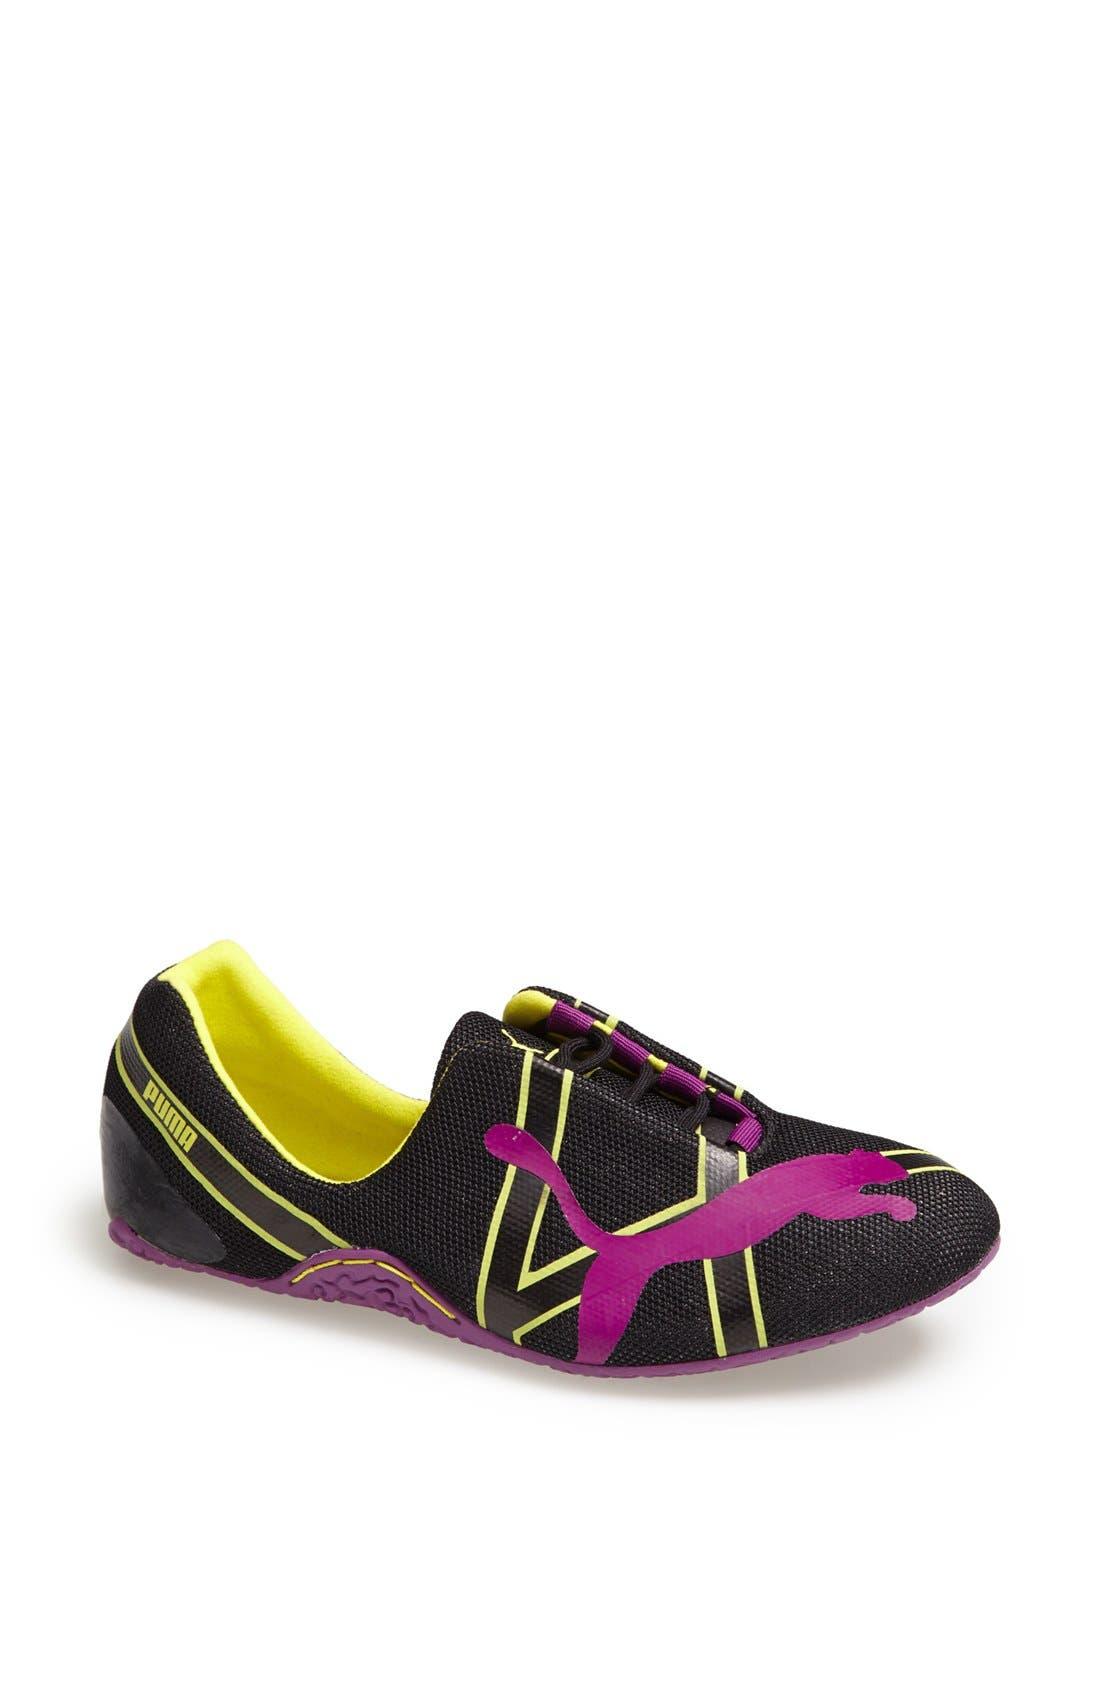 PUMA, 'Anaida' Foldable Sneaker, Main thumbnail 1, color, 001